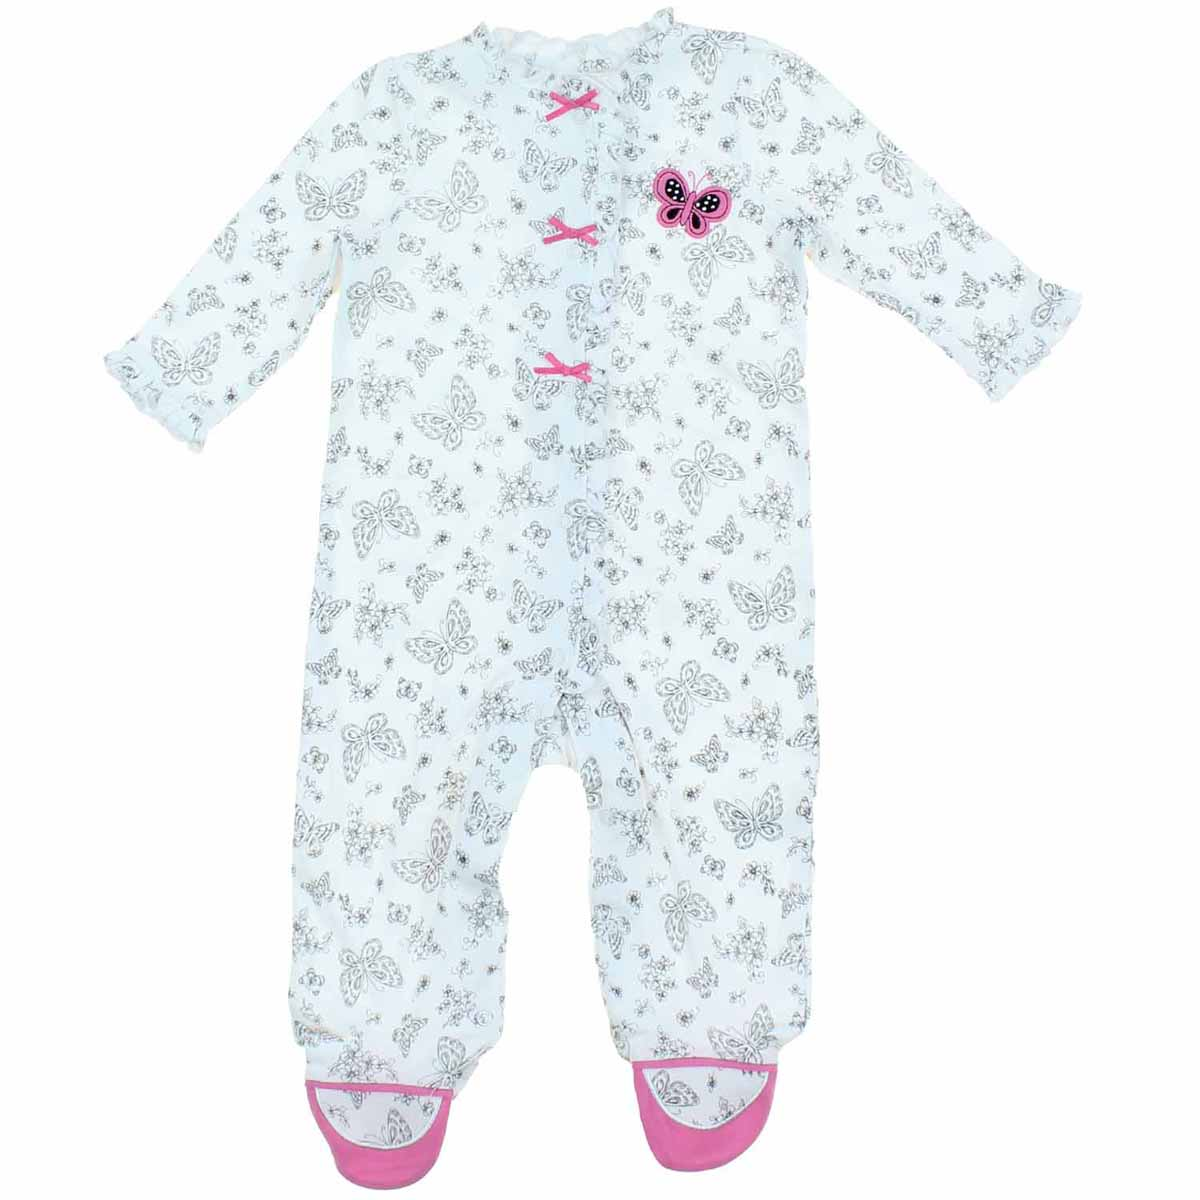 7f38077f3 LITTLE ME Baby or Toddler Girls 1-Piece Snug Fitting Sleeper Pajama ...